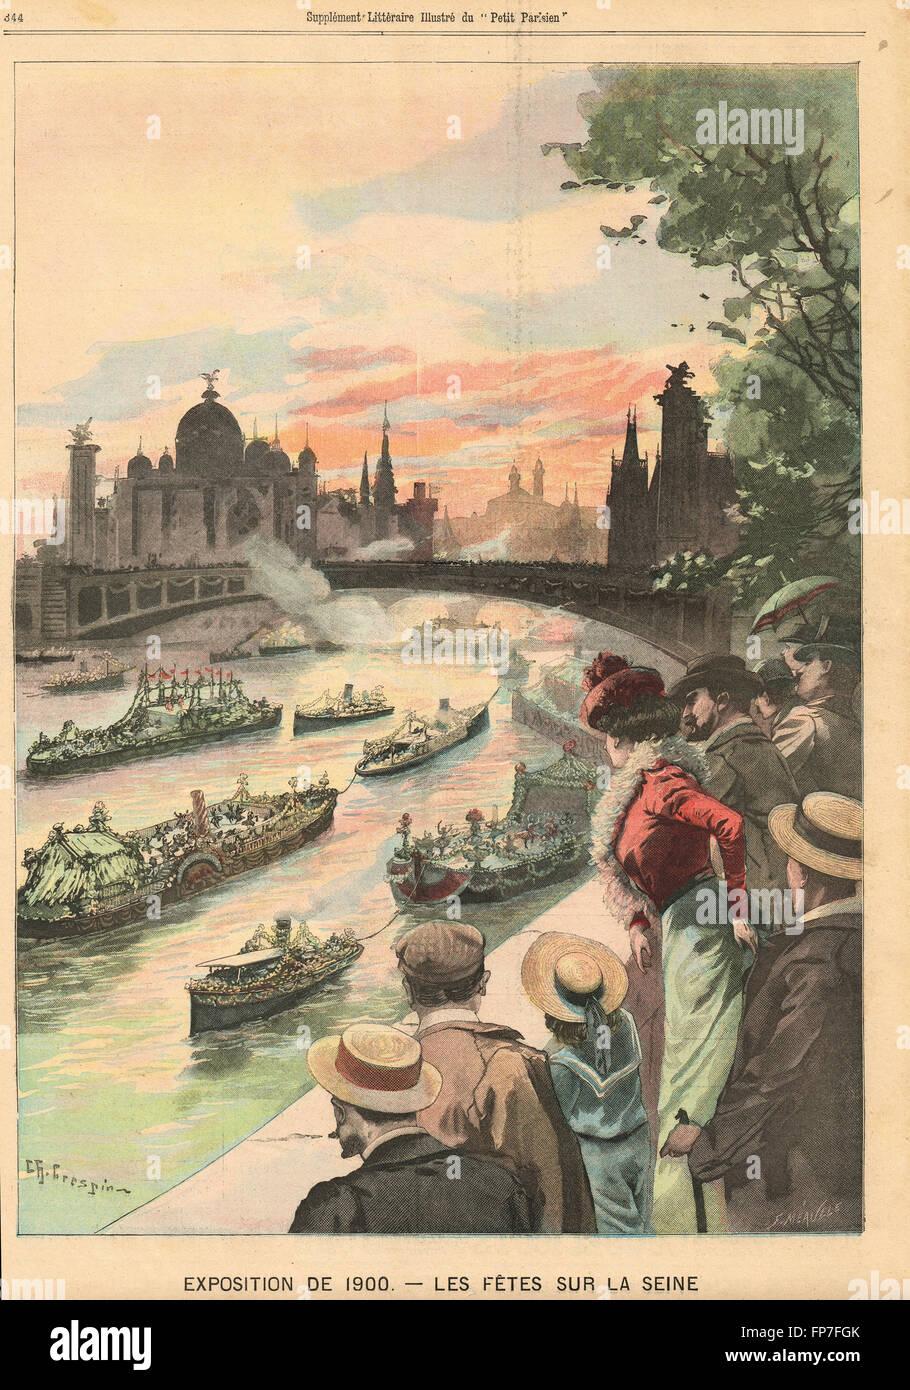 Celebrations on the Seine Paris Exhibition 1900 - Stock Image